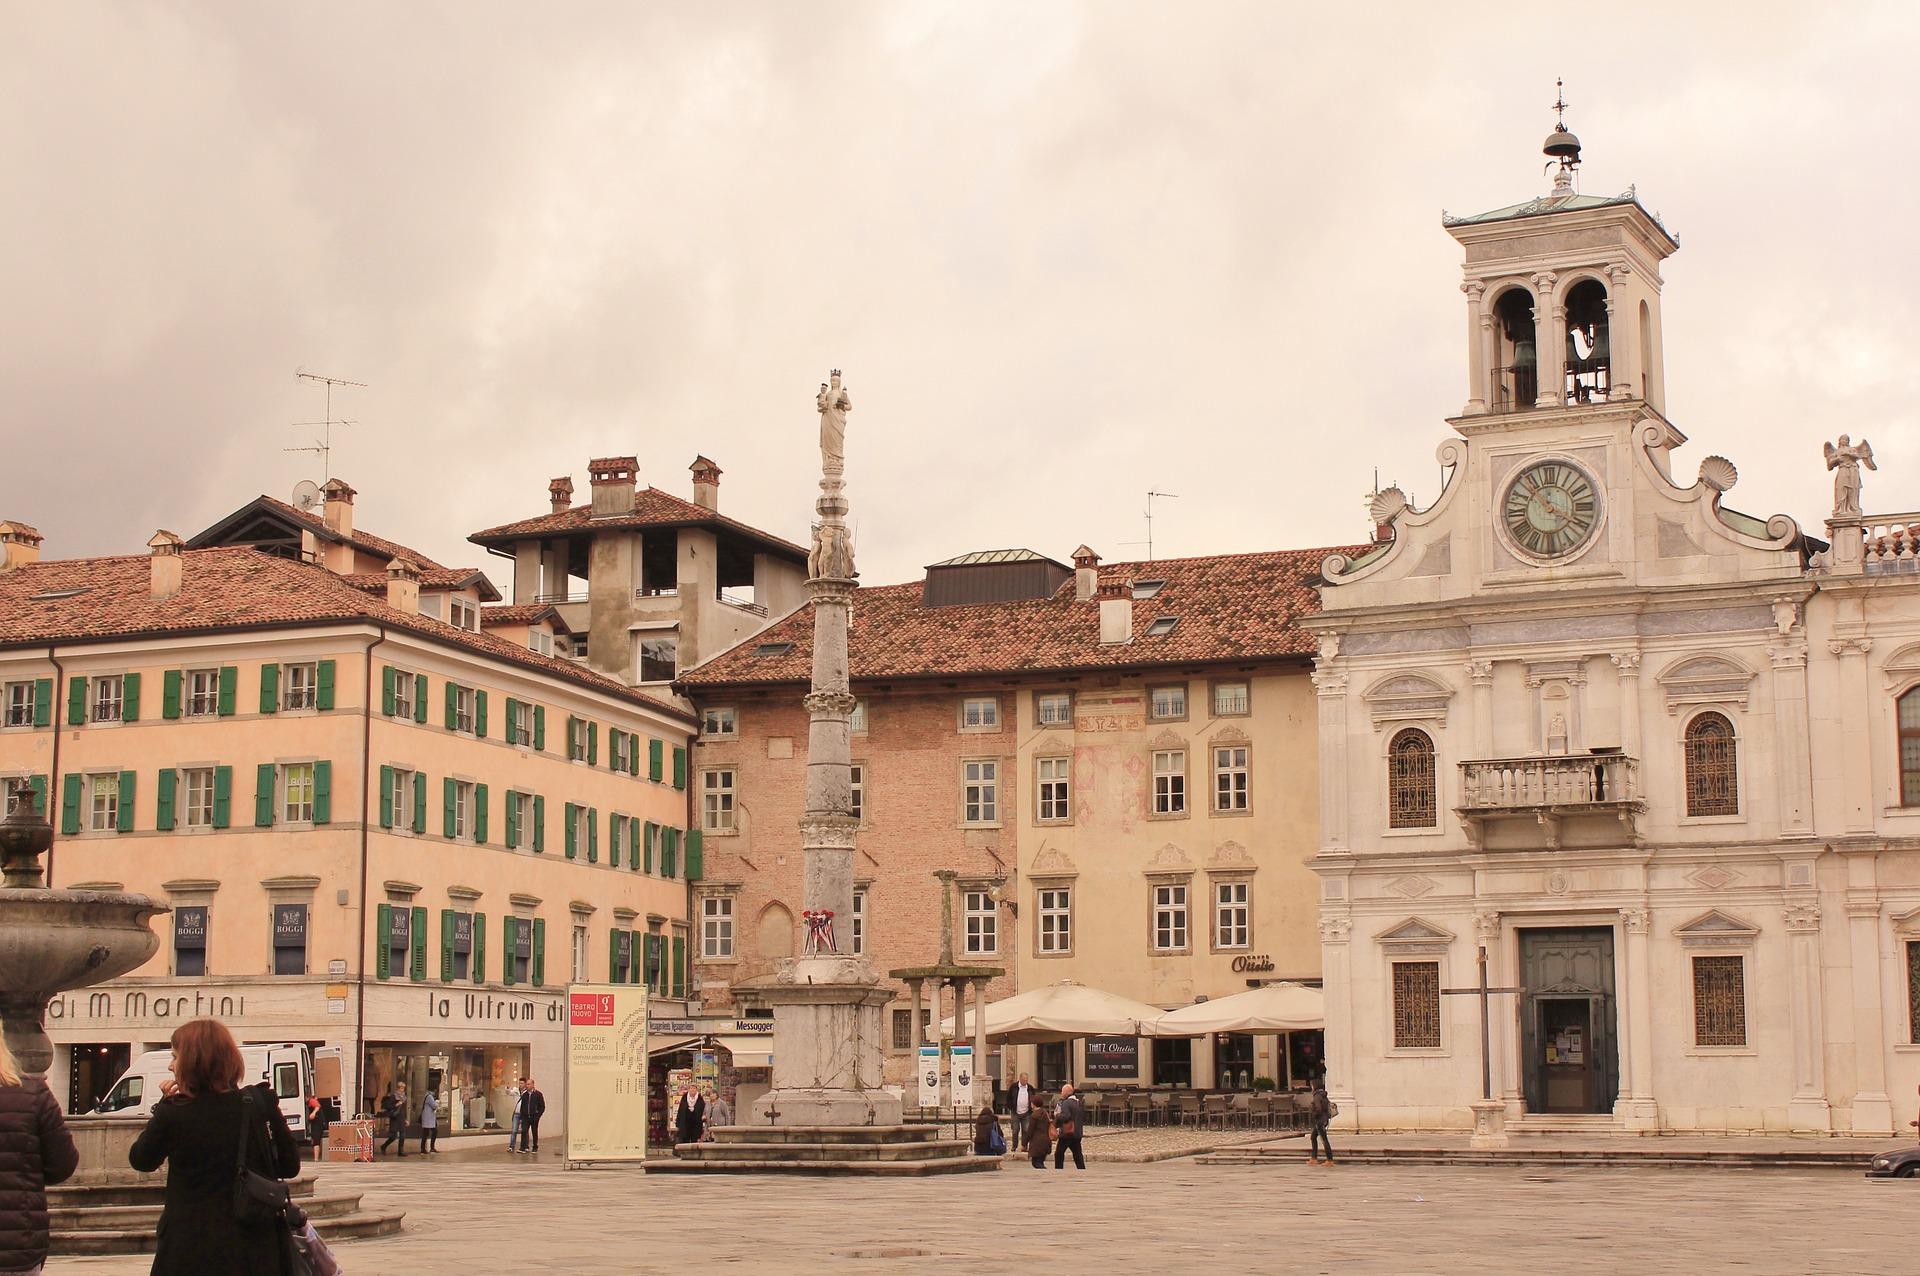 Allevamento Bouledogue Francese In Friuli Venezia Giulia Find The